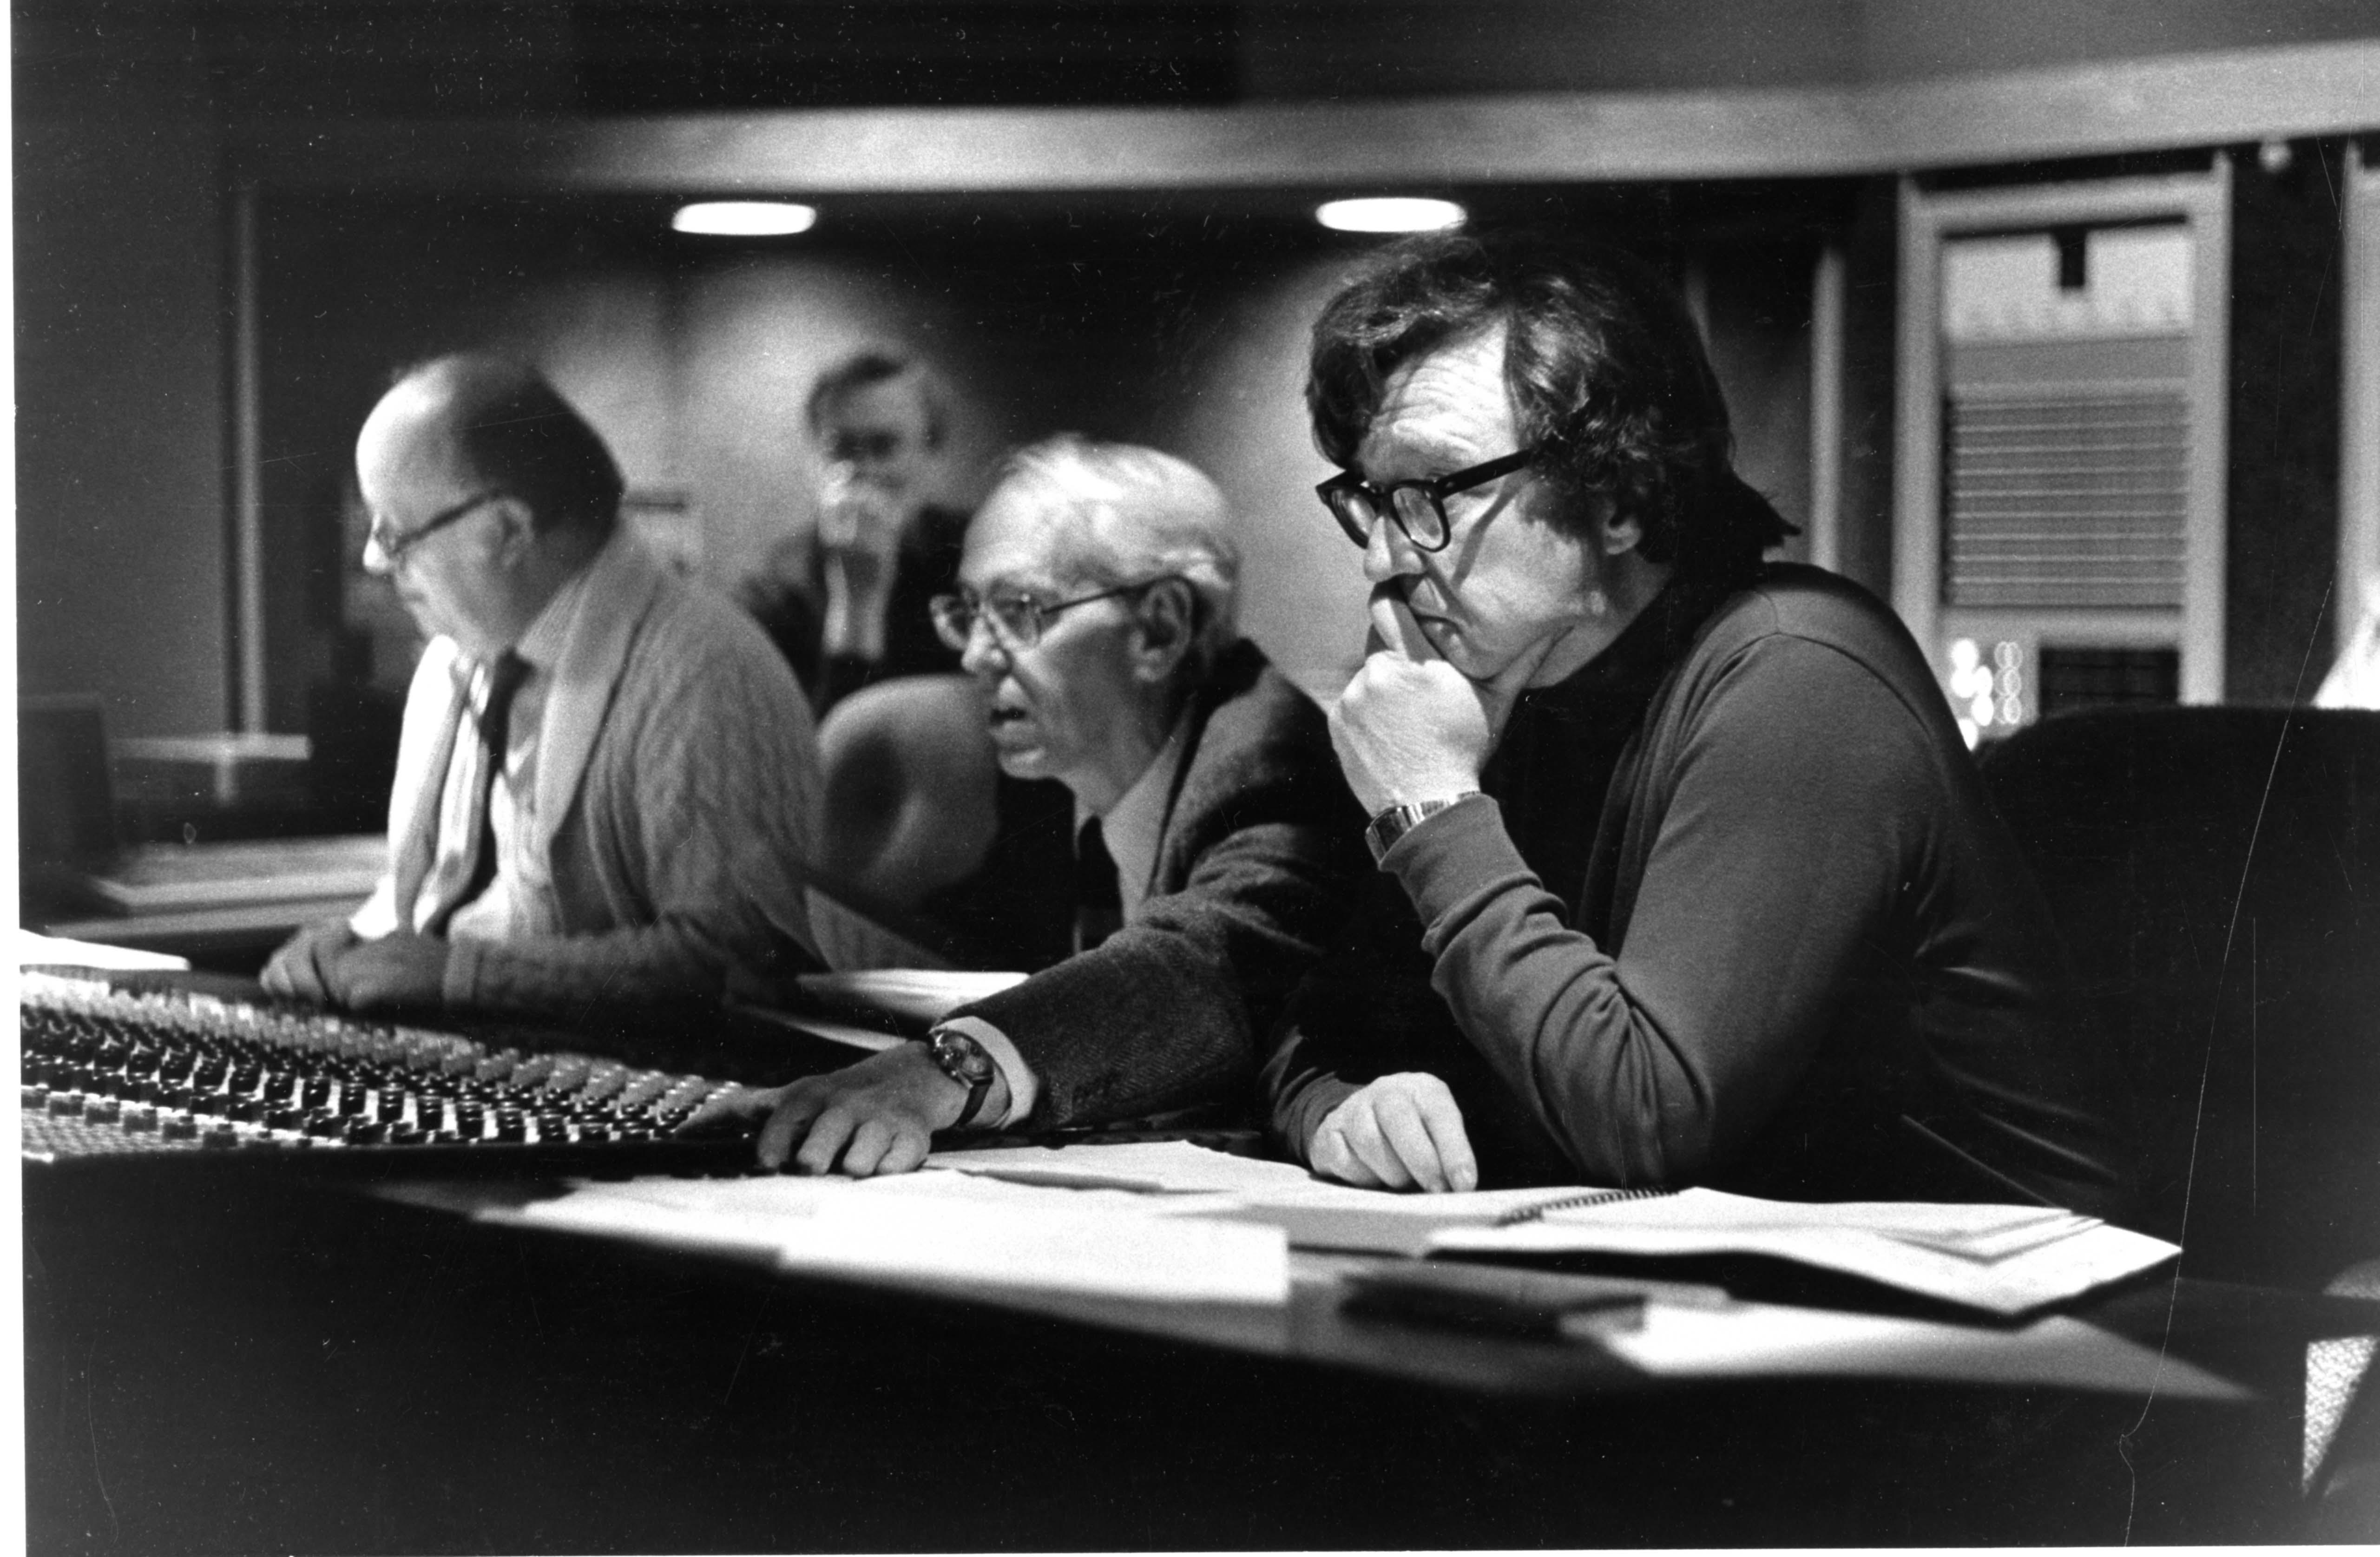 Donald Neuen at a recording session, 1987